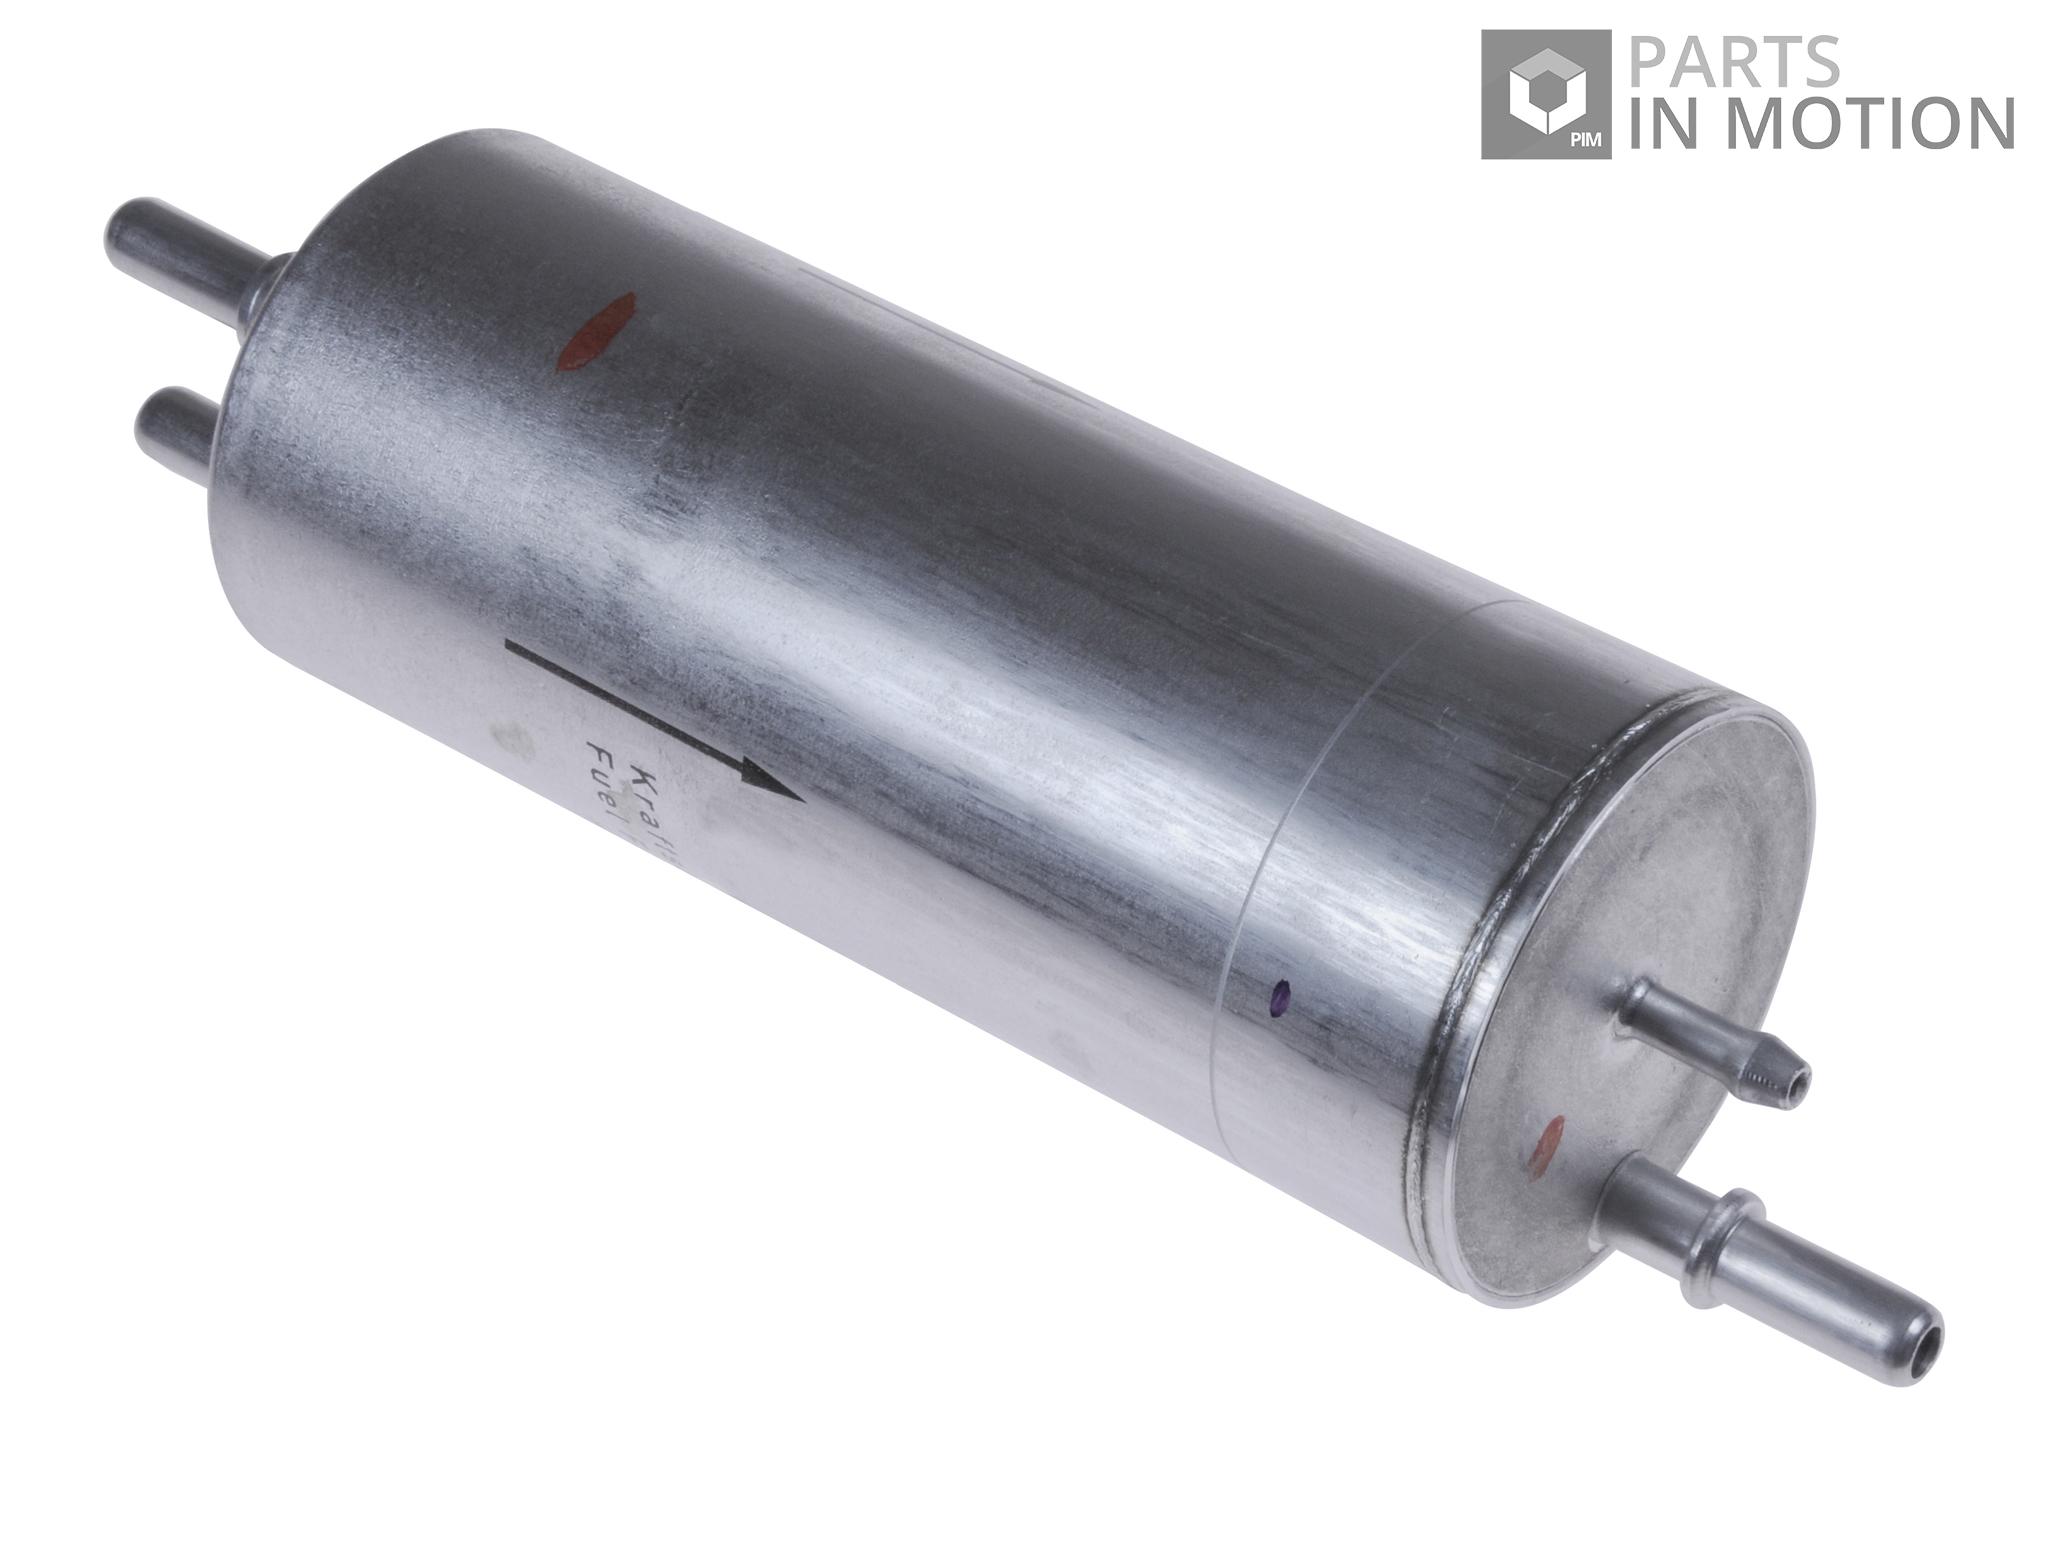 Fuel Filter Fits Bmw X5 E53 30 02 To 06 M54 Adl 16126754016 Quality Alco Filters Blue Print Adj132313